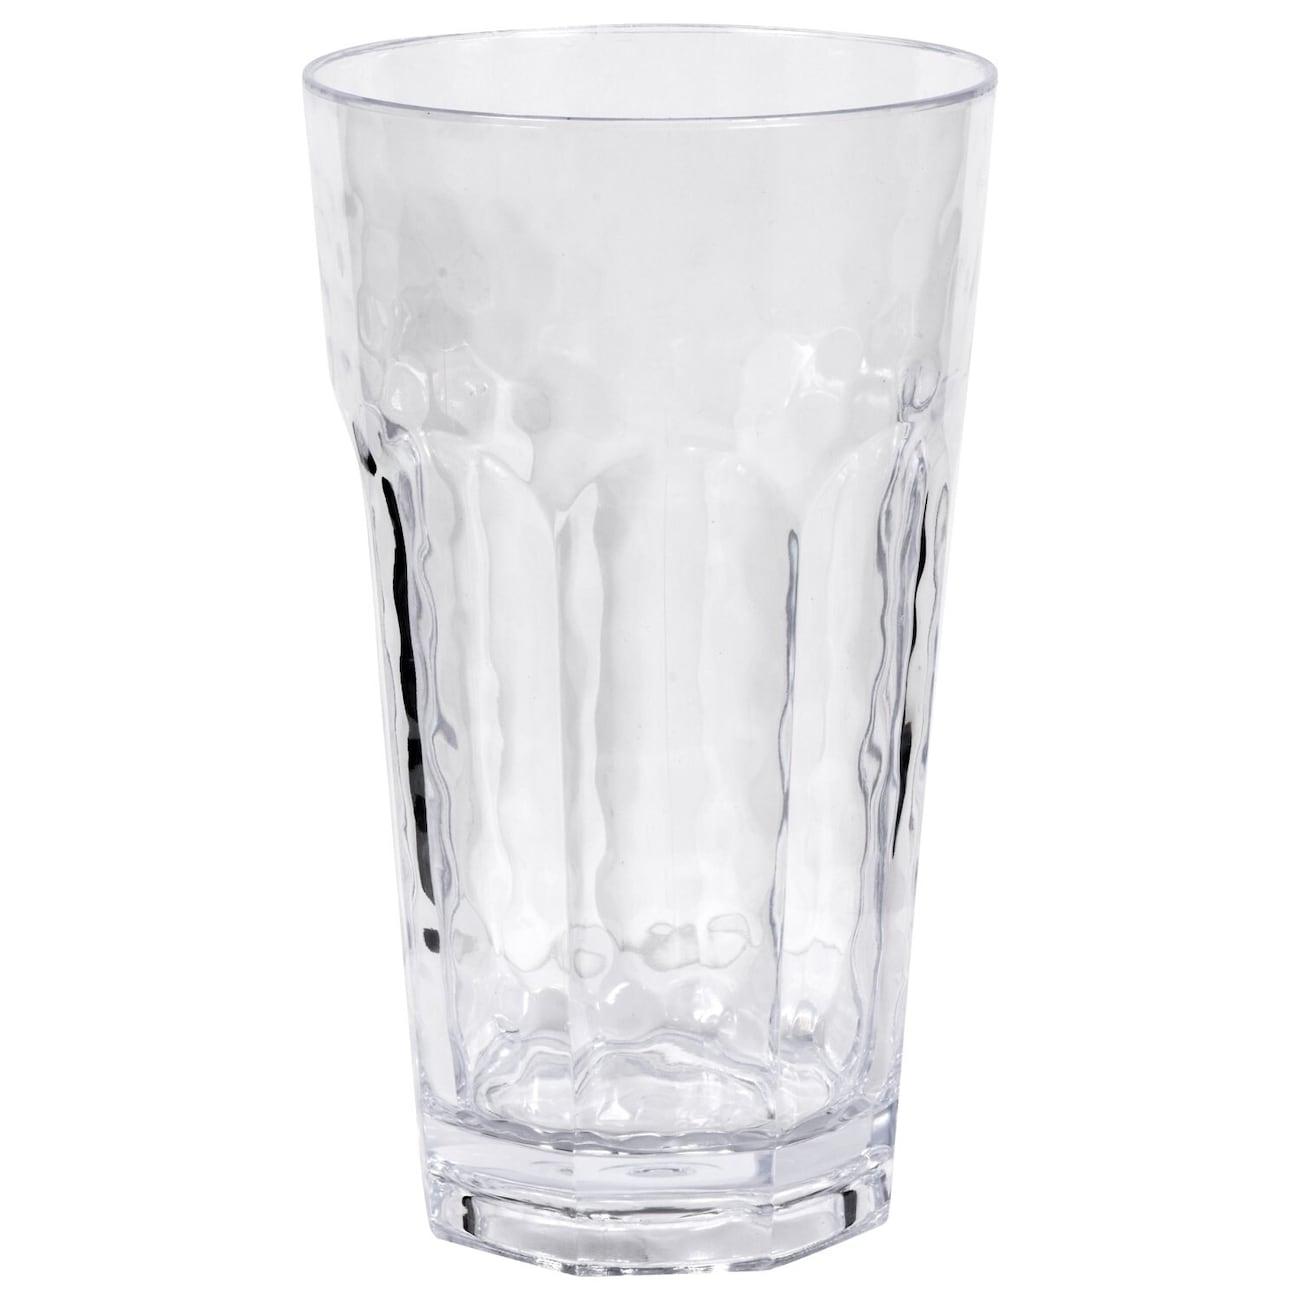 2ae76913b32 Clear Dimpled Plastic Drinking Tumblers, 22 oz.